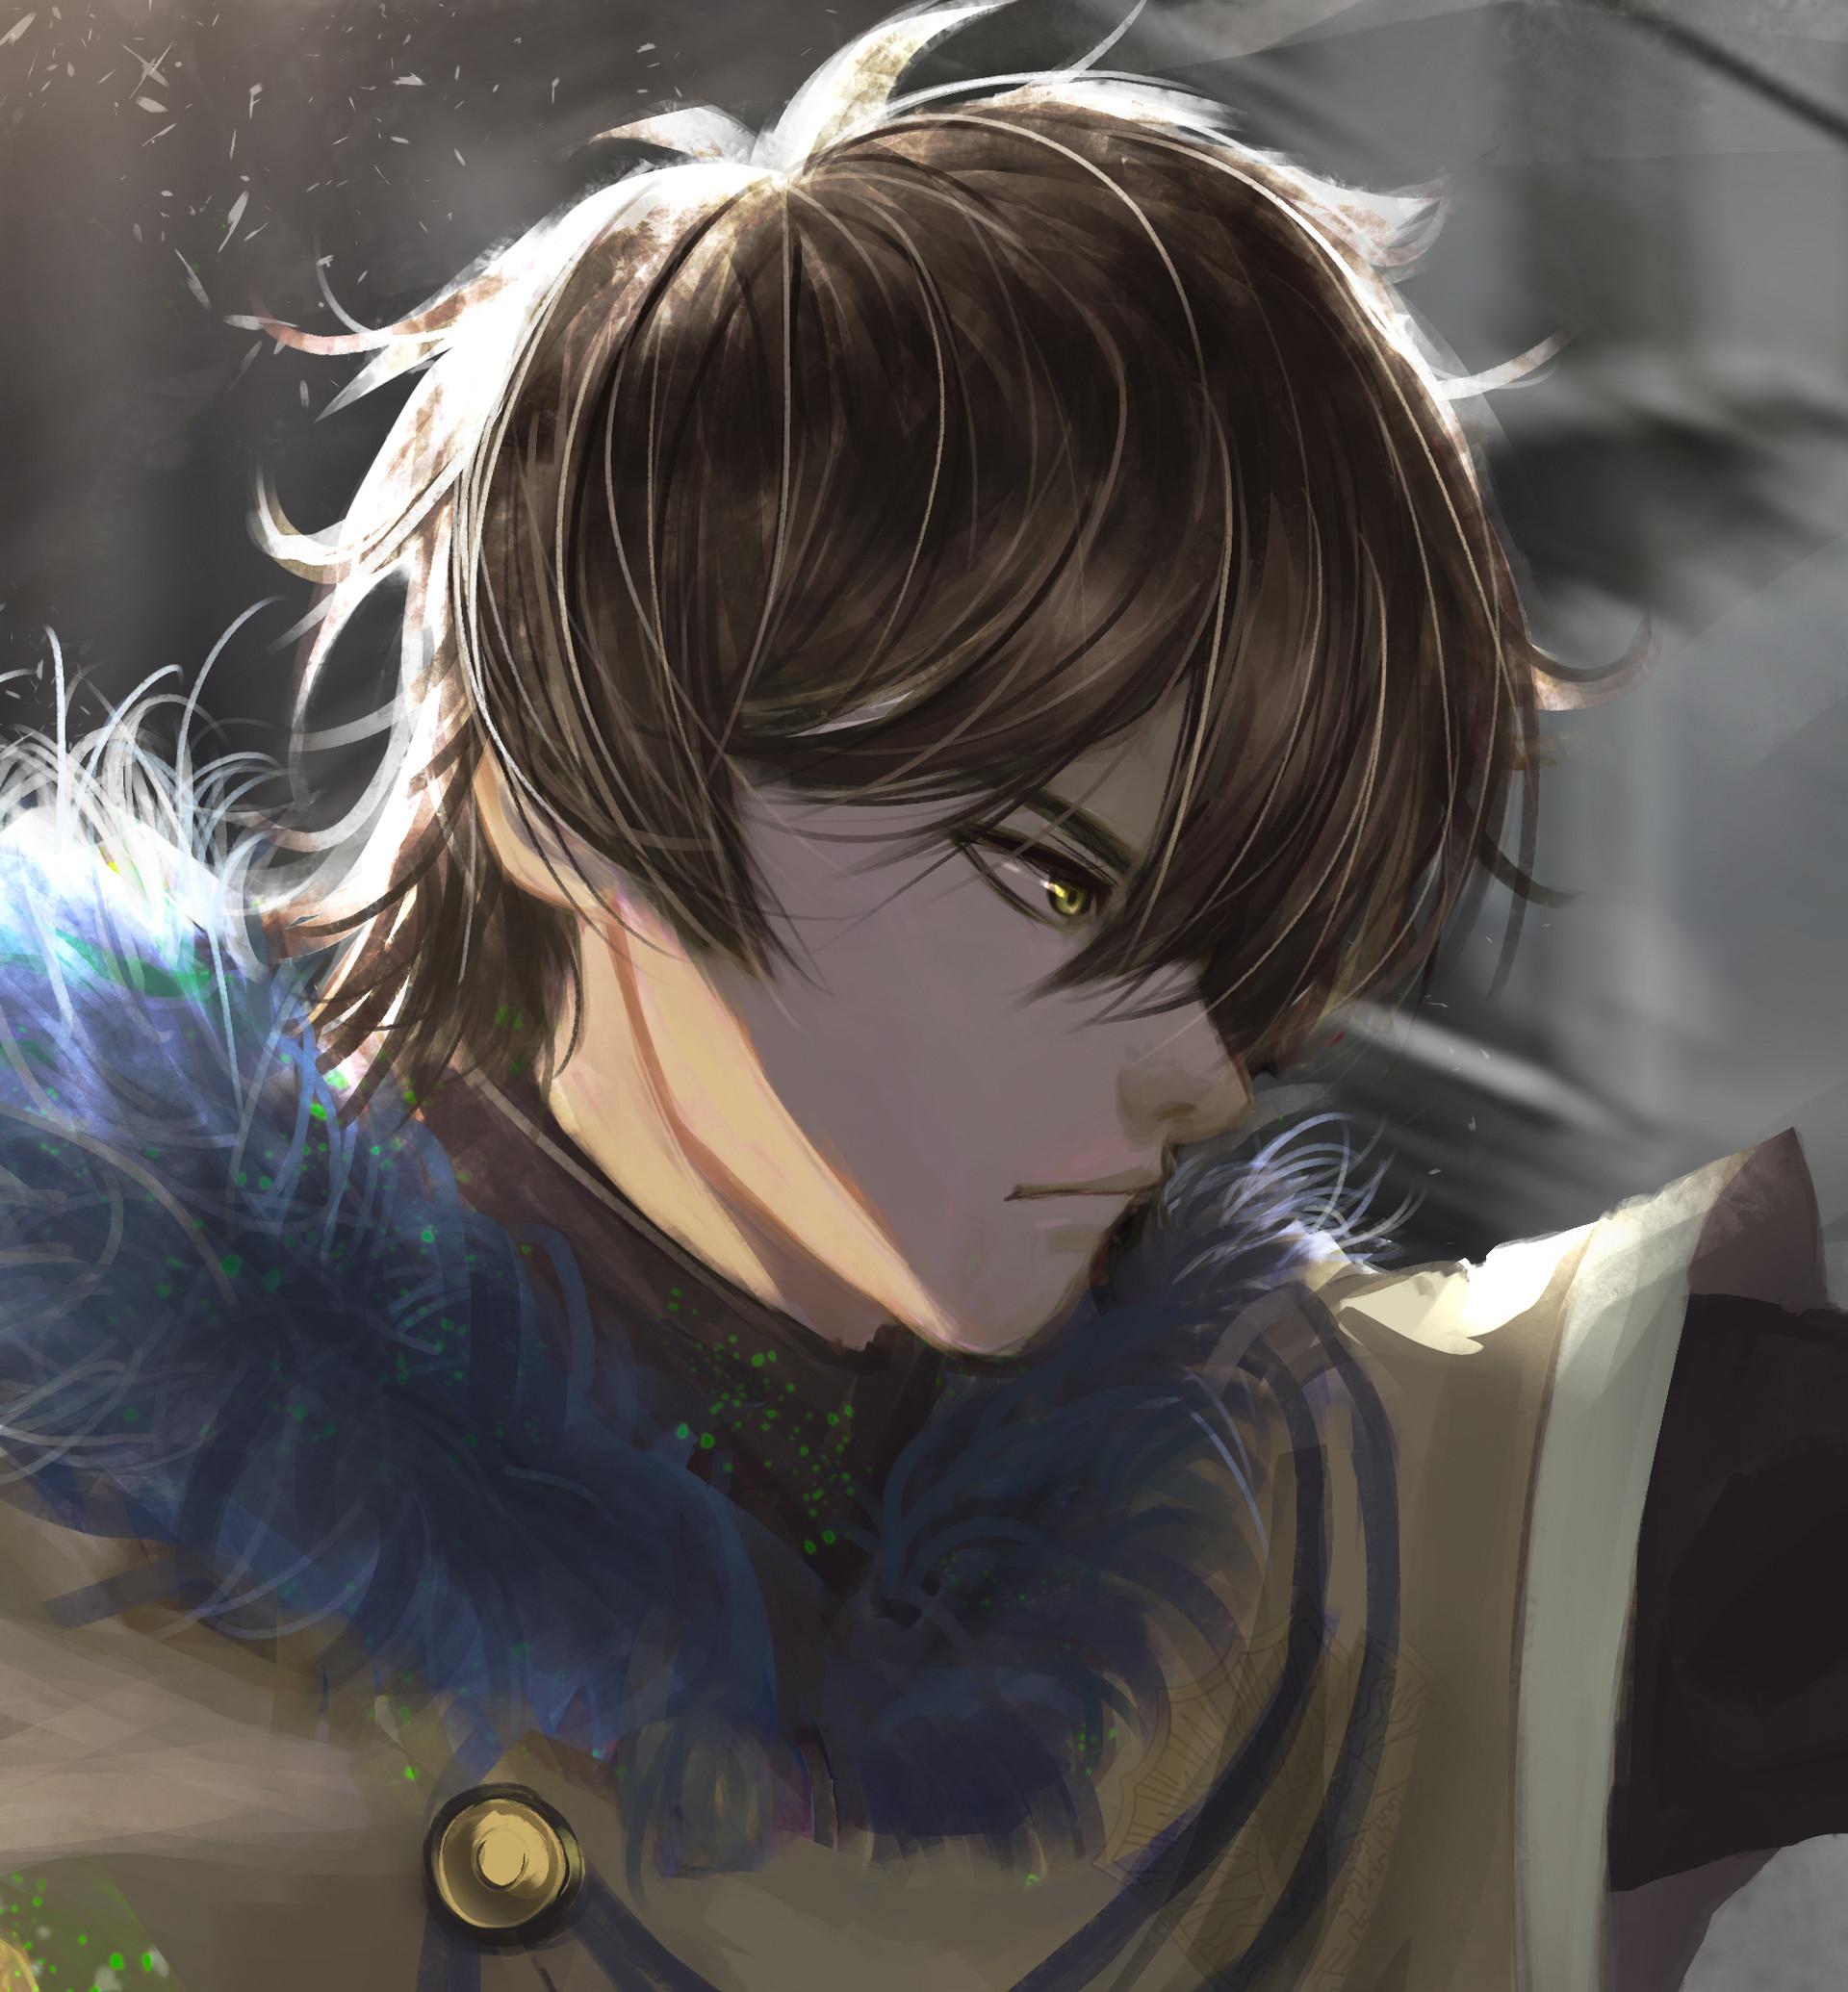 ArtStation - Yuno_Wind Magic, PrinceG07 .